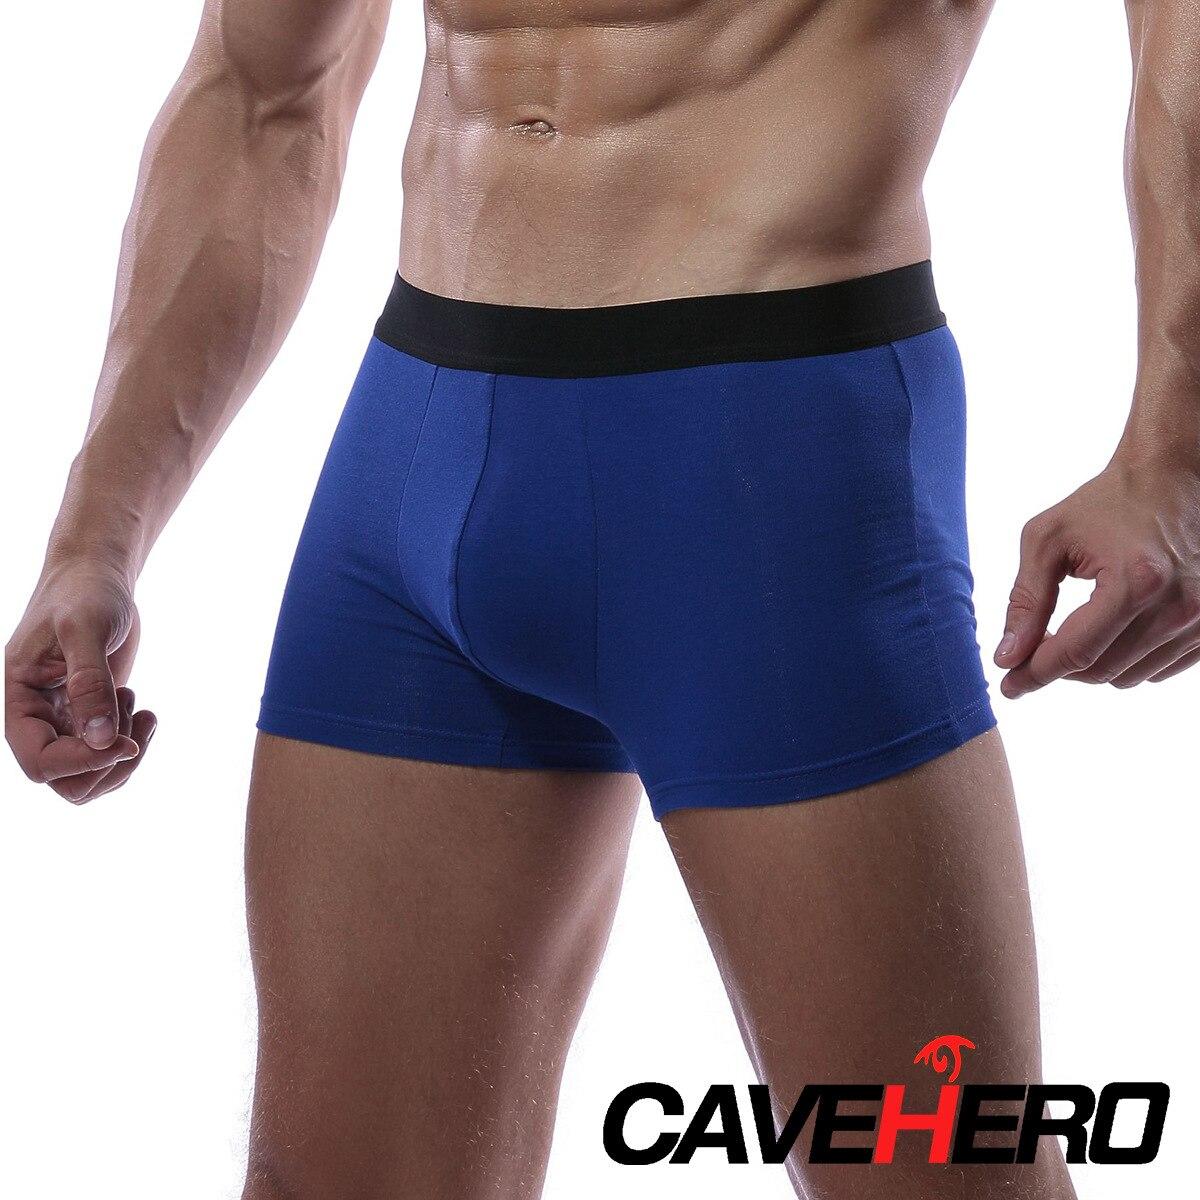 Modal Men's Underwear Breathable Men's Boxer Trousers Men's Mid-Waist Braid Underwear